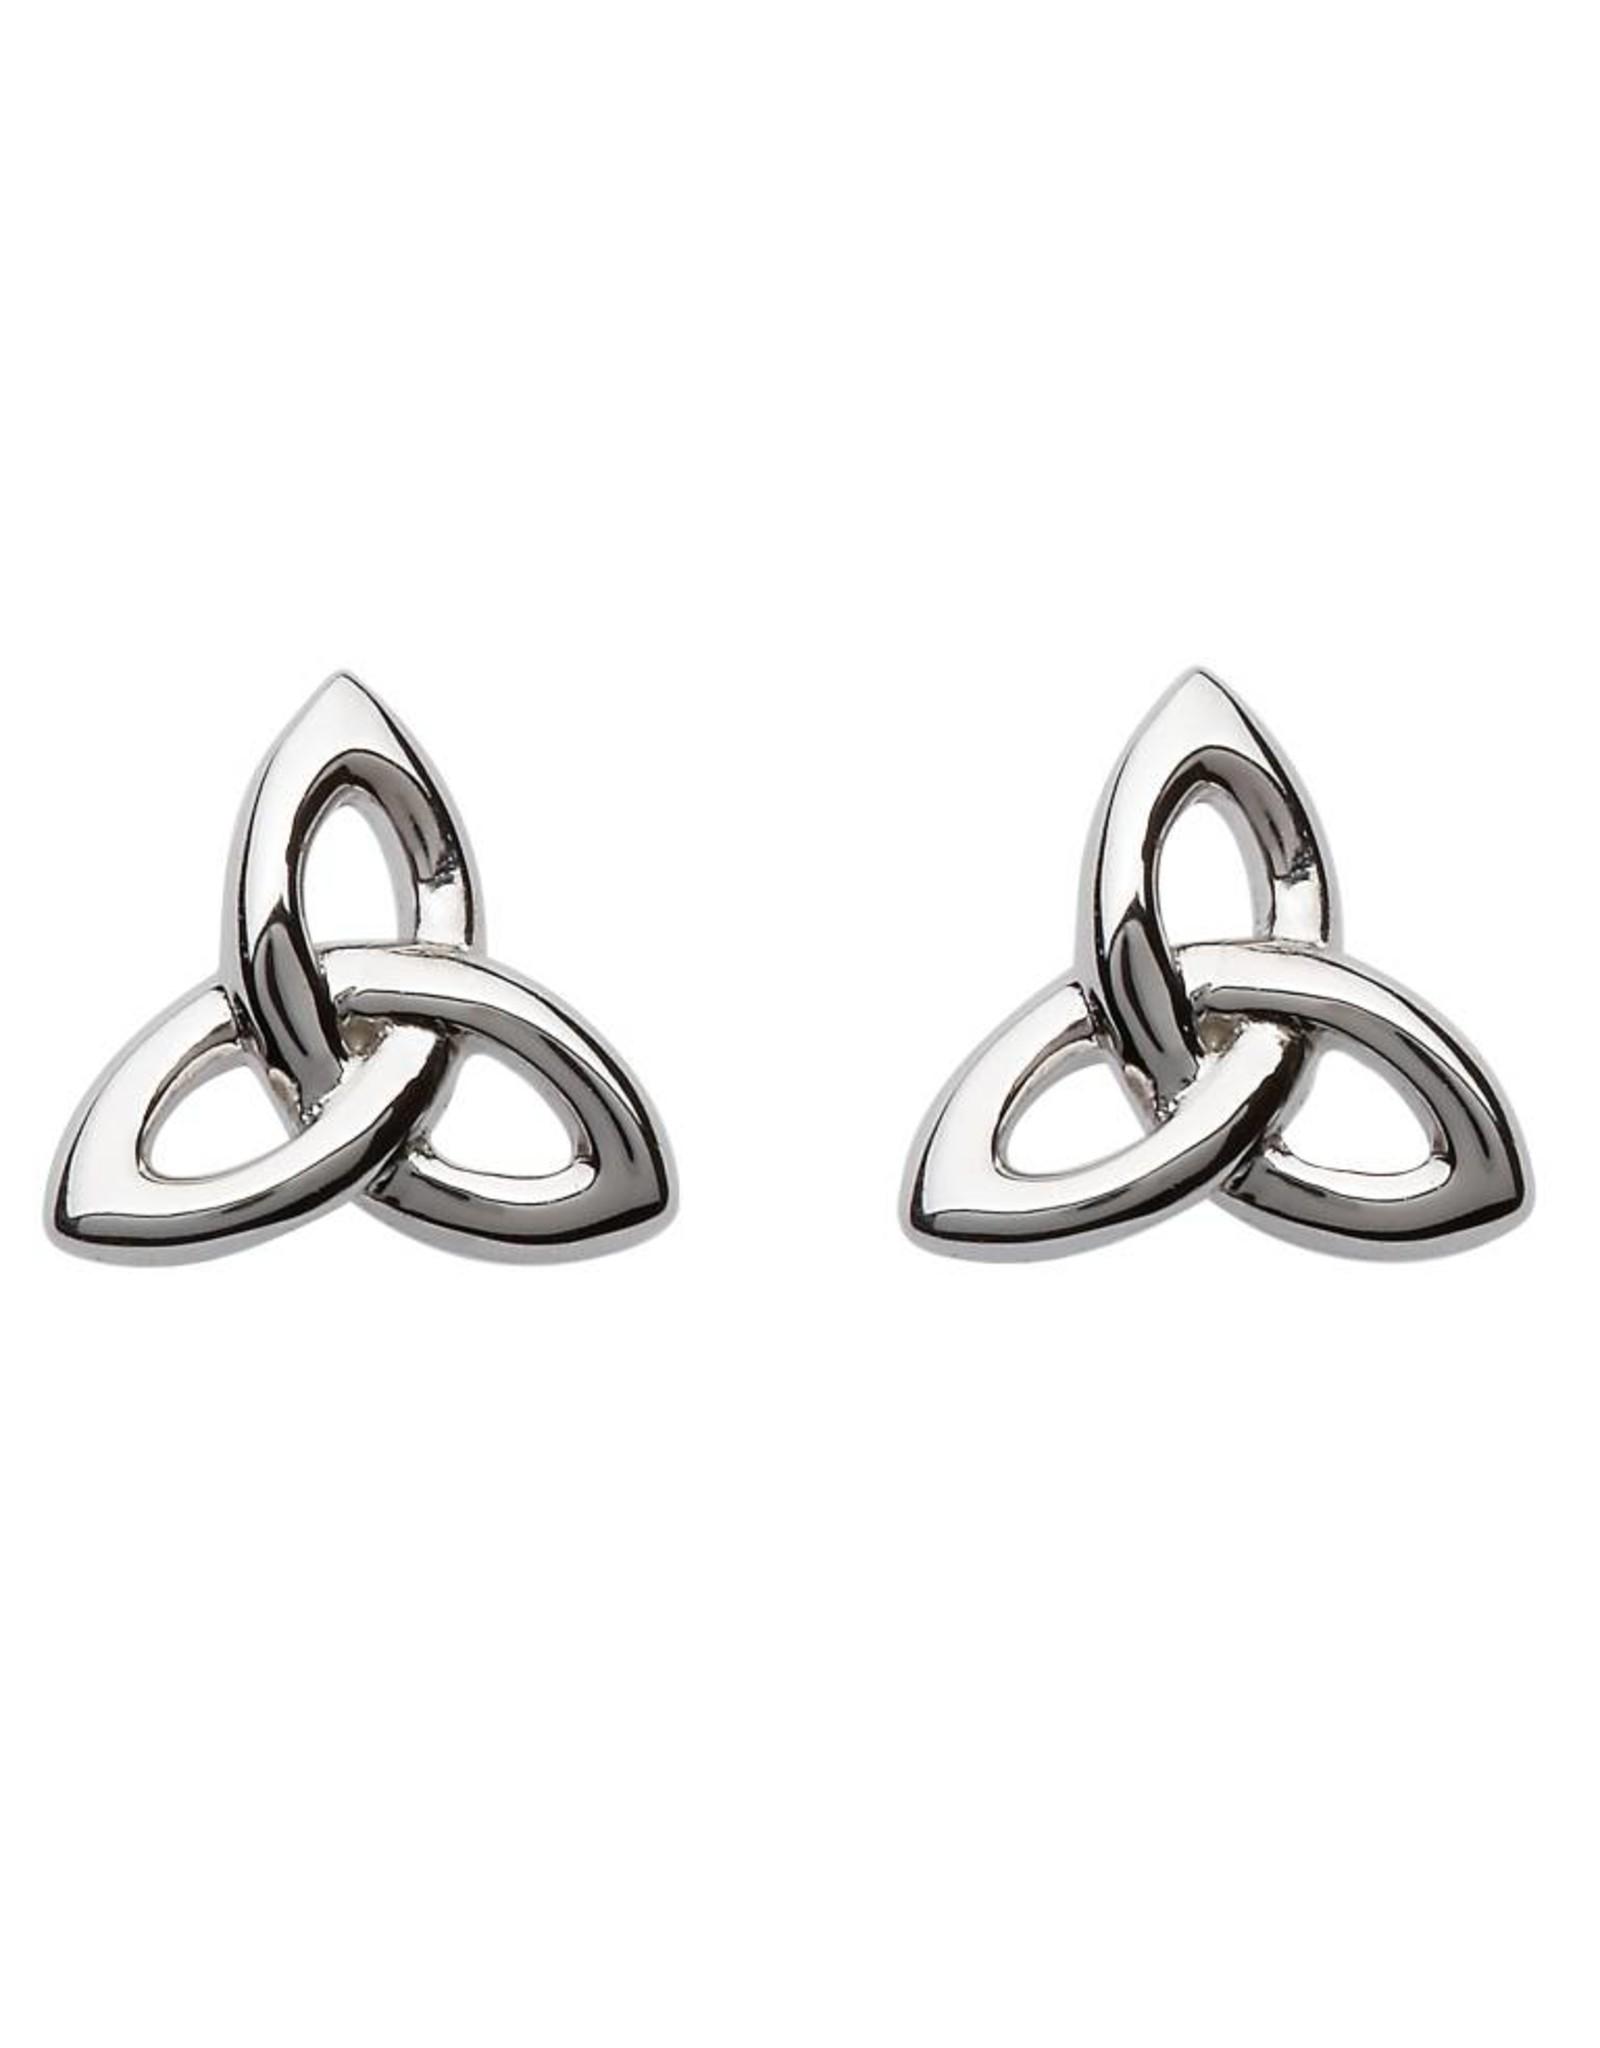 Shanore Trinity Knot Stud Earrings